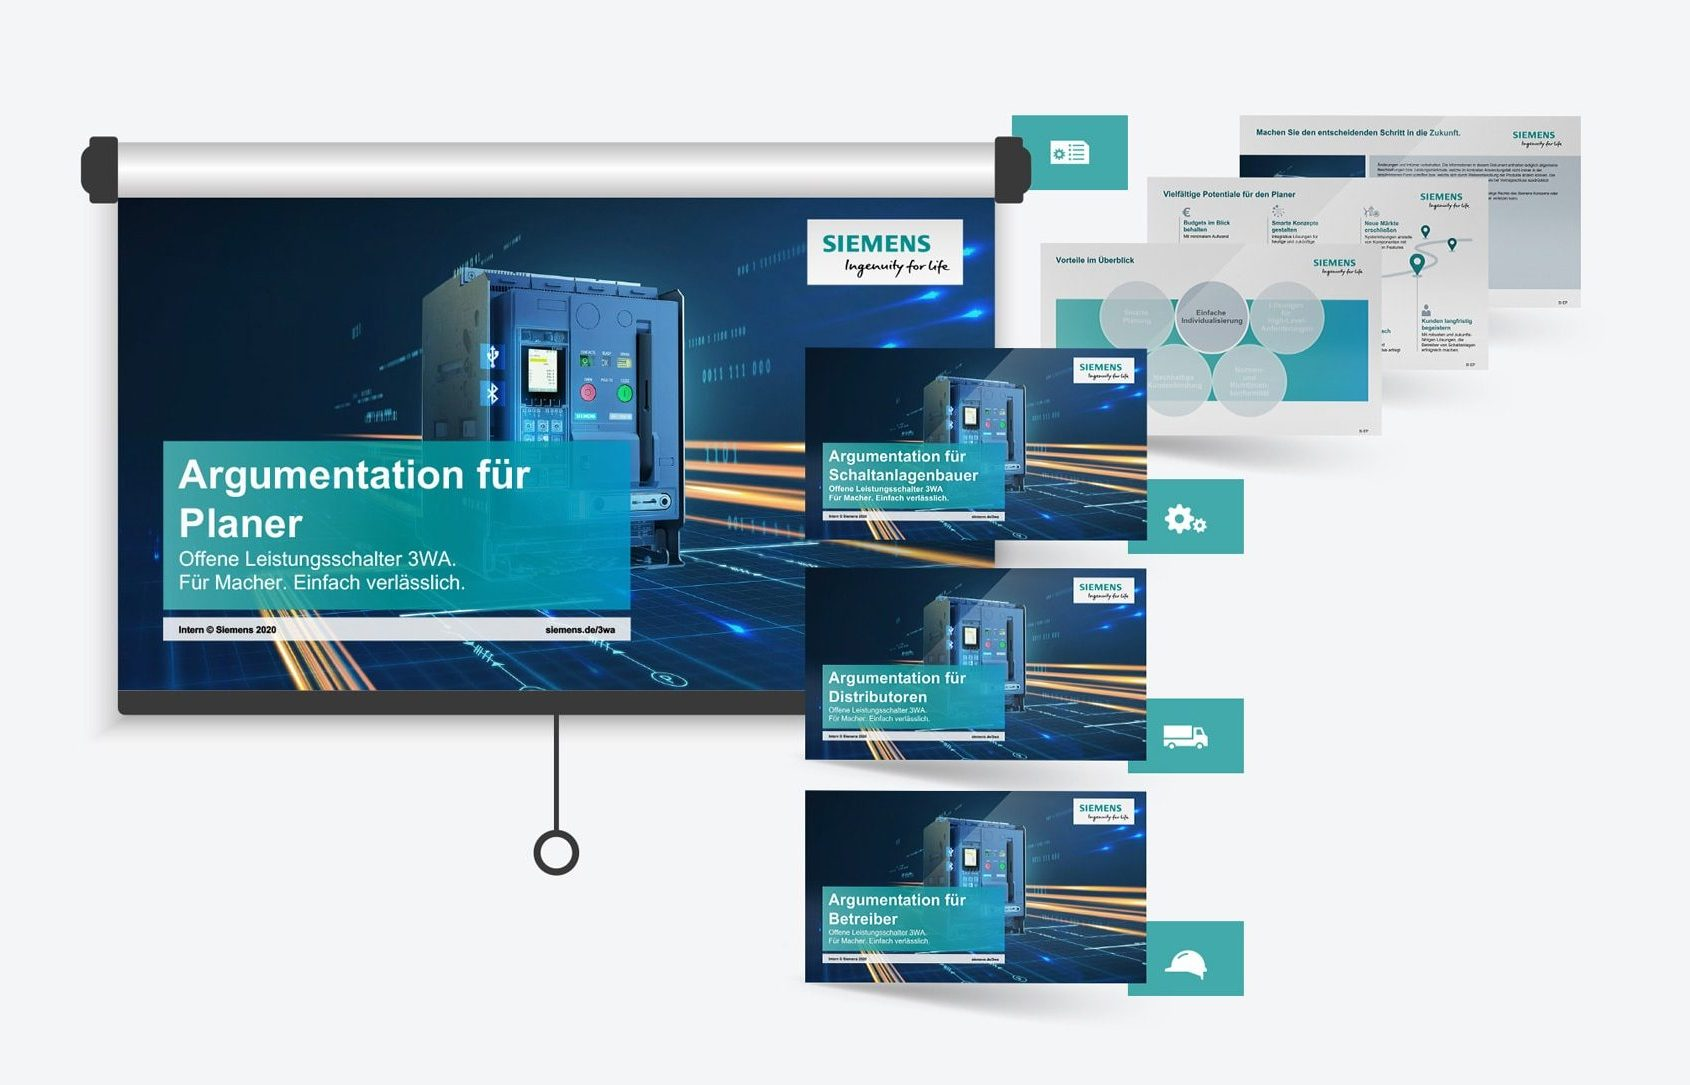 Siemens-Präsentationen